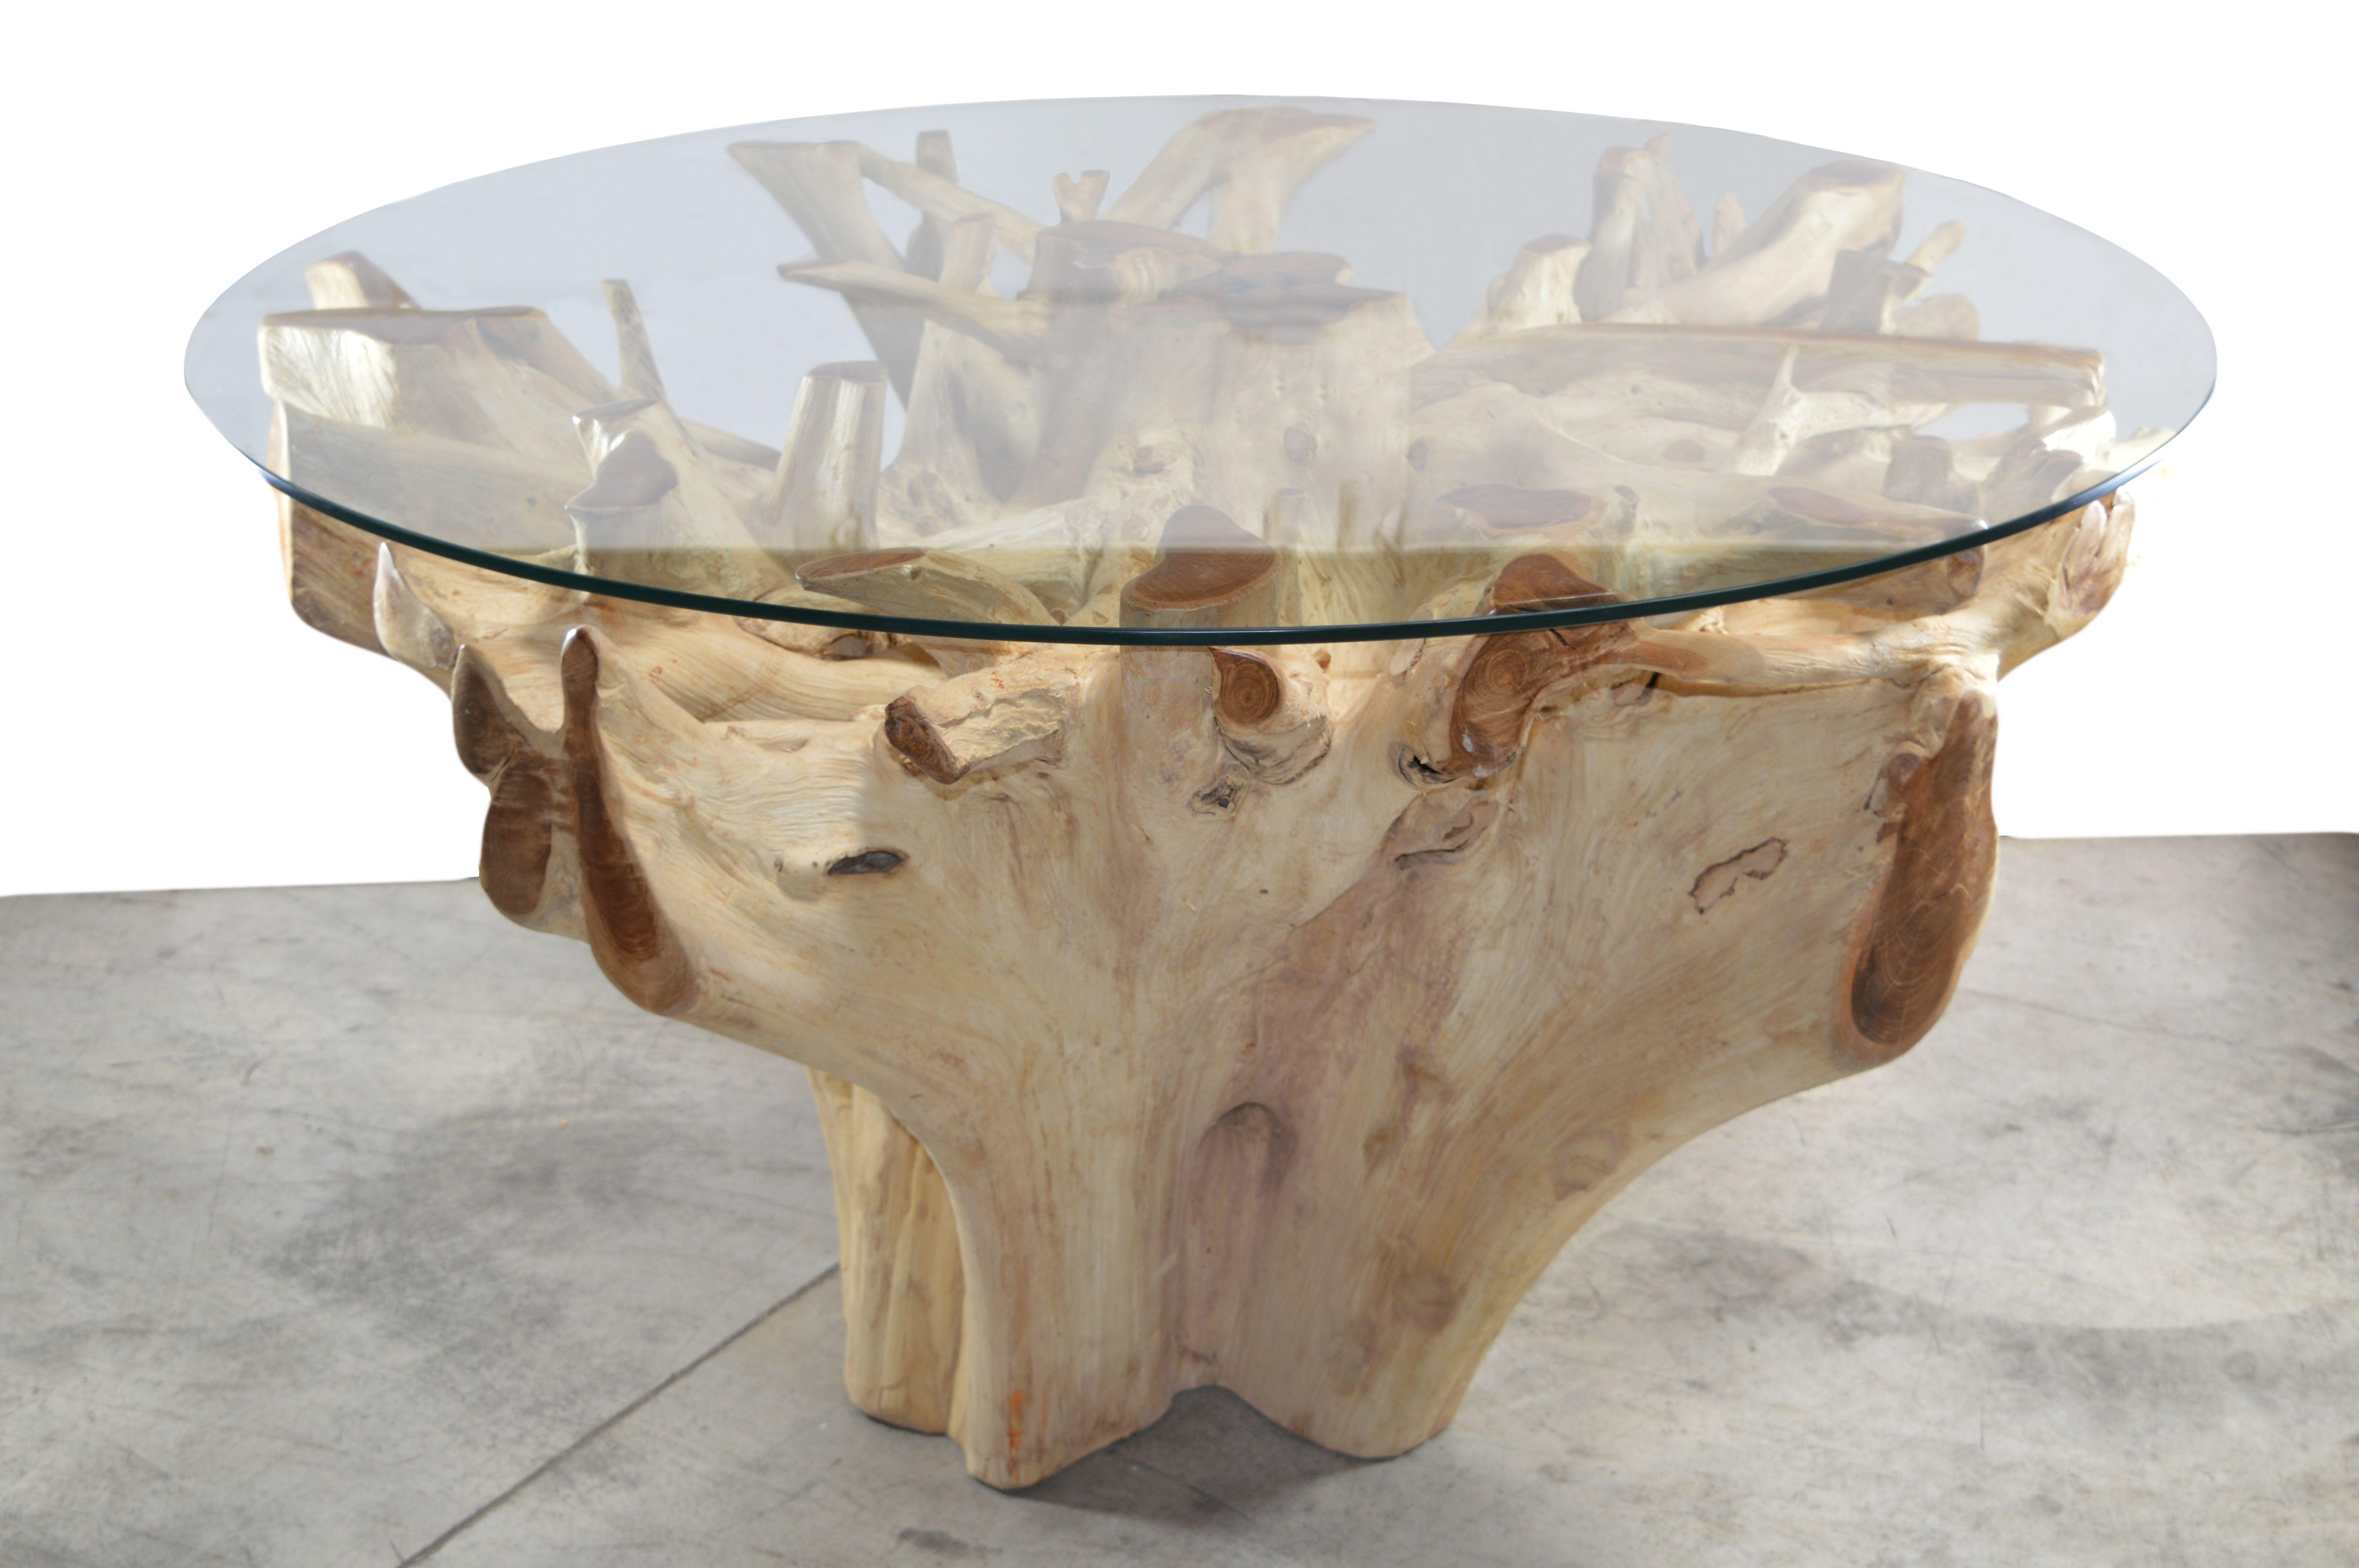 4dadb731fb2f3bbd3d721d715a78c3c9 Impressionnant De Table Basse Opium Conception